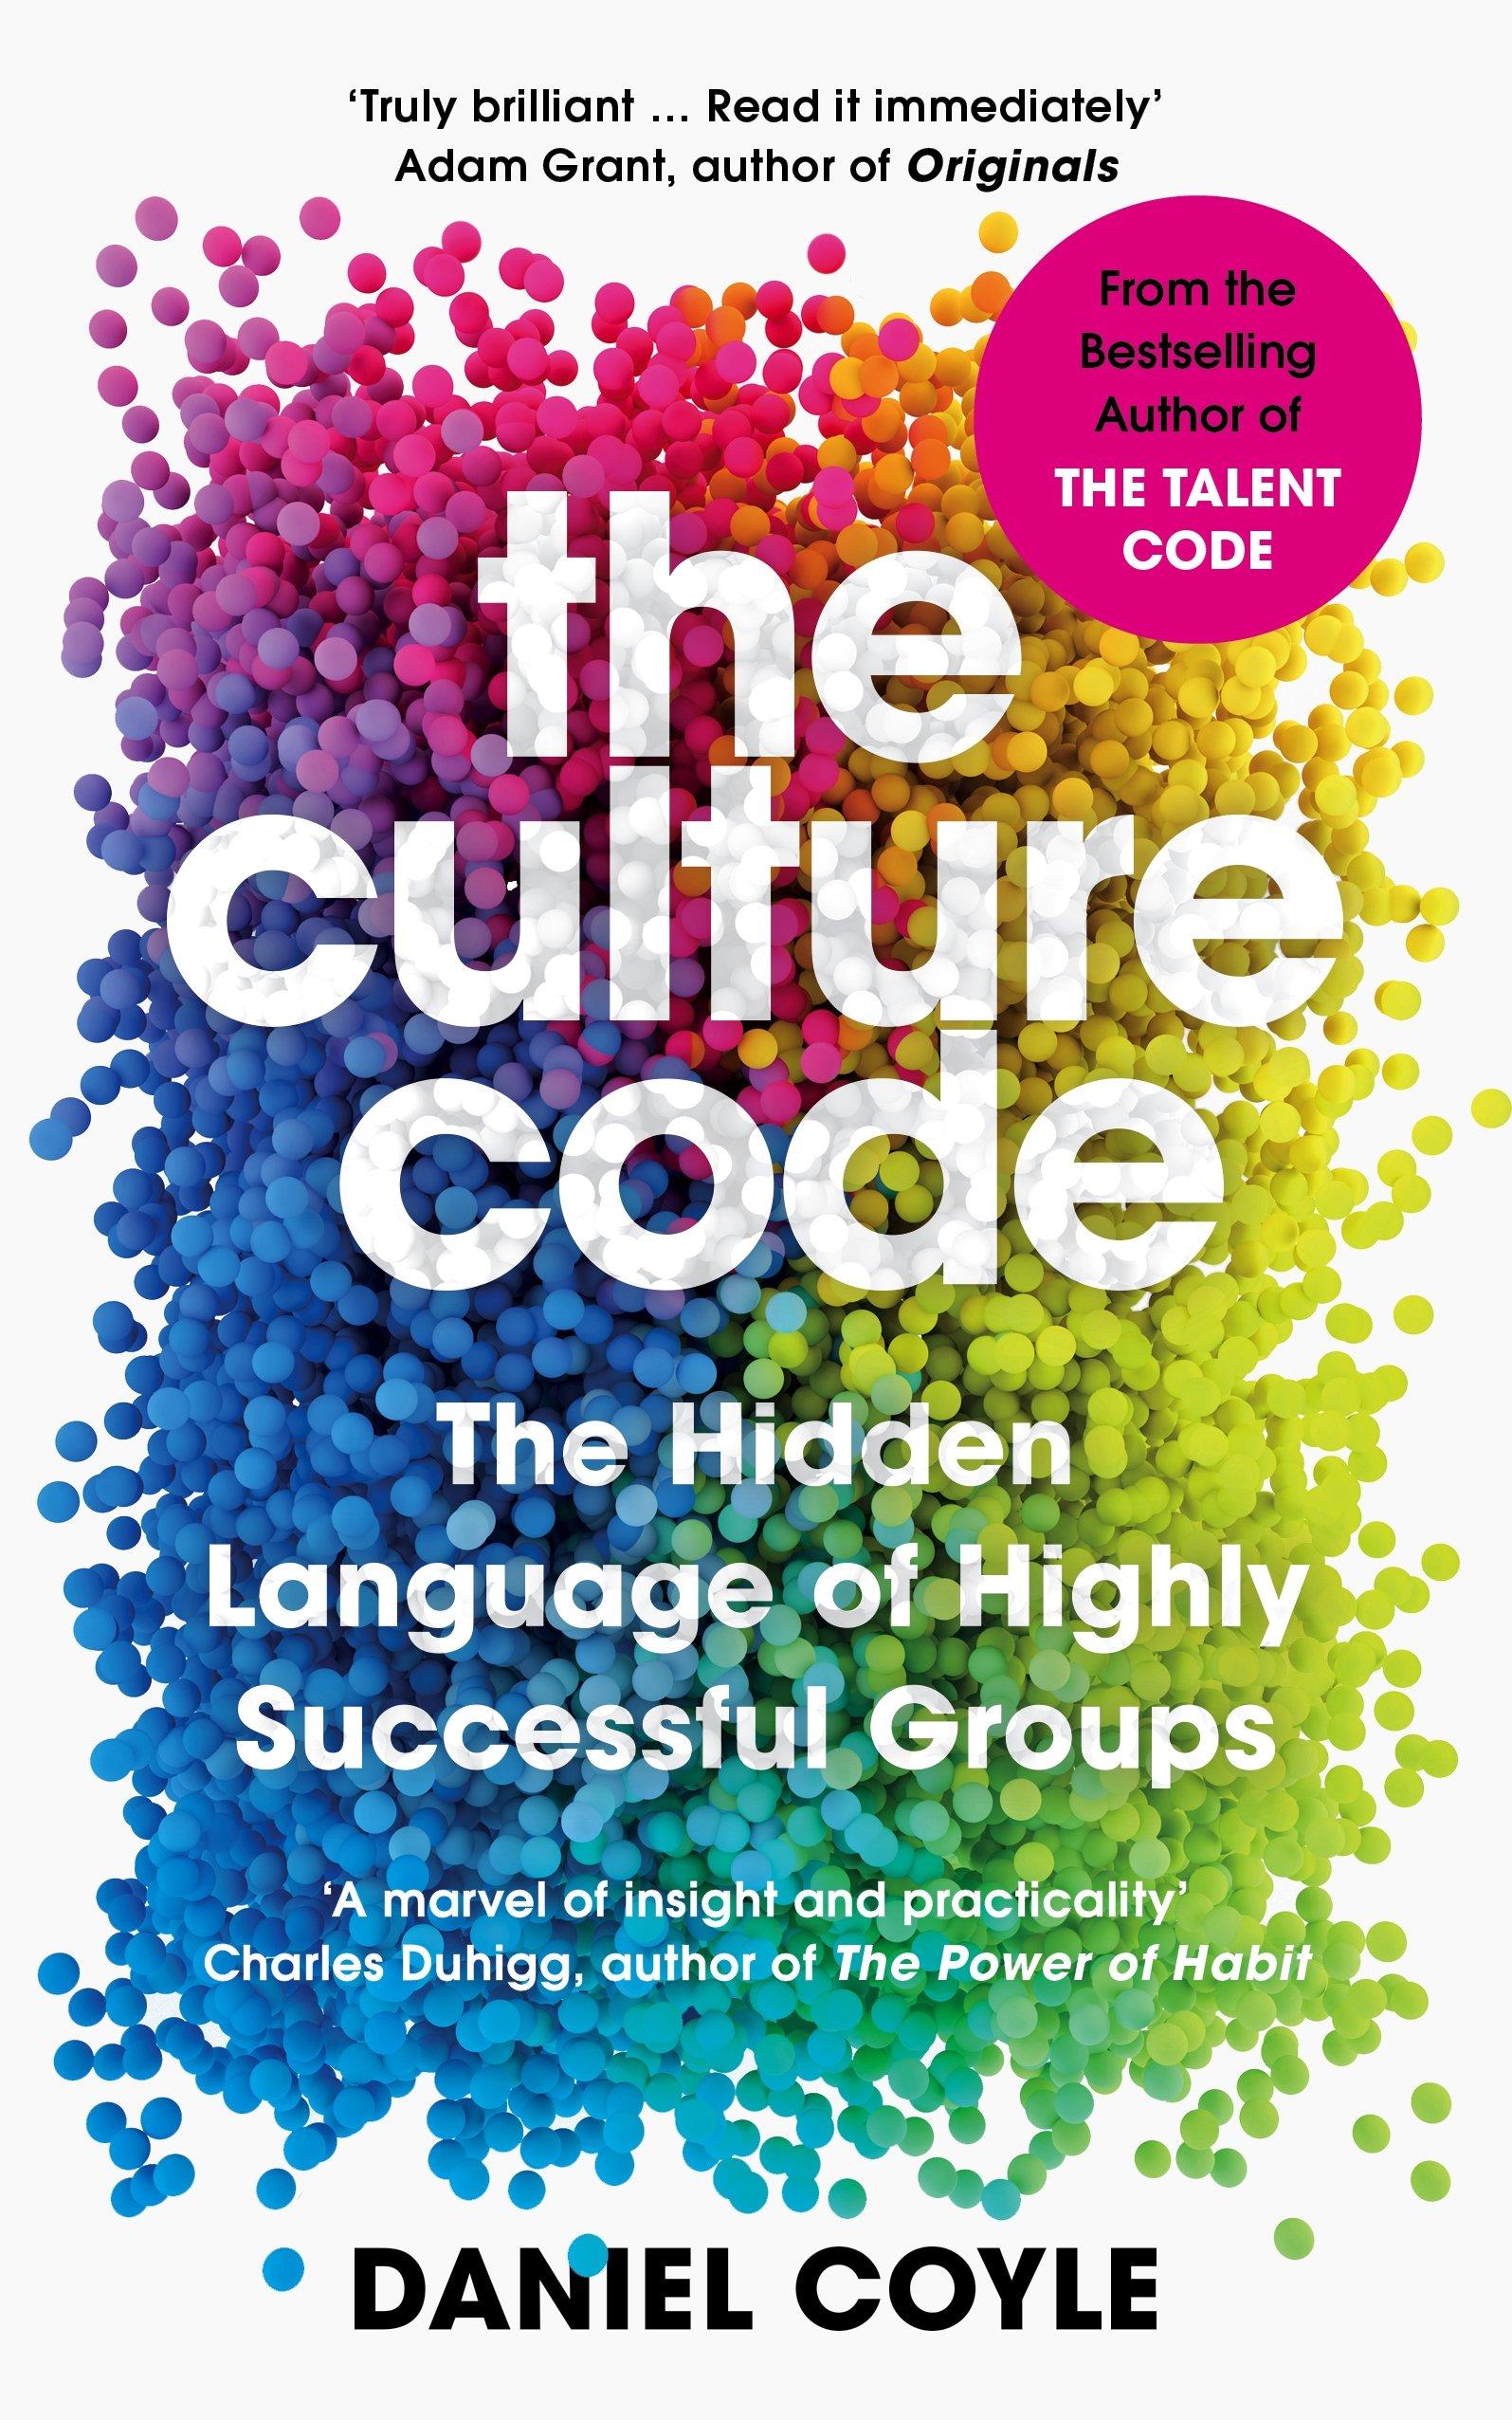 Daniel Coyle: Kódolt kultúra